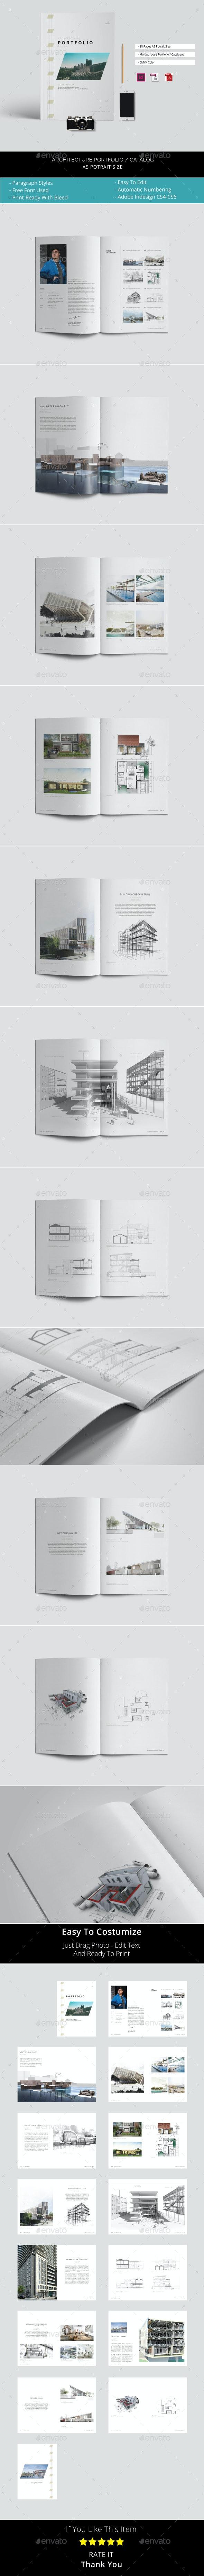 A5 Architecture Portfolio / Catalogue - Portfolio Brochures